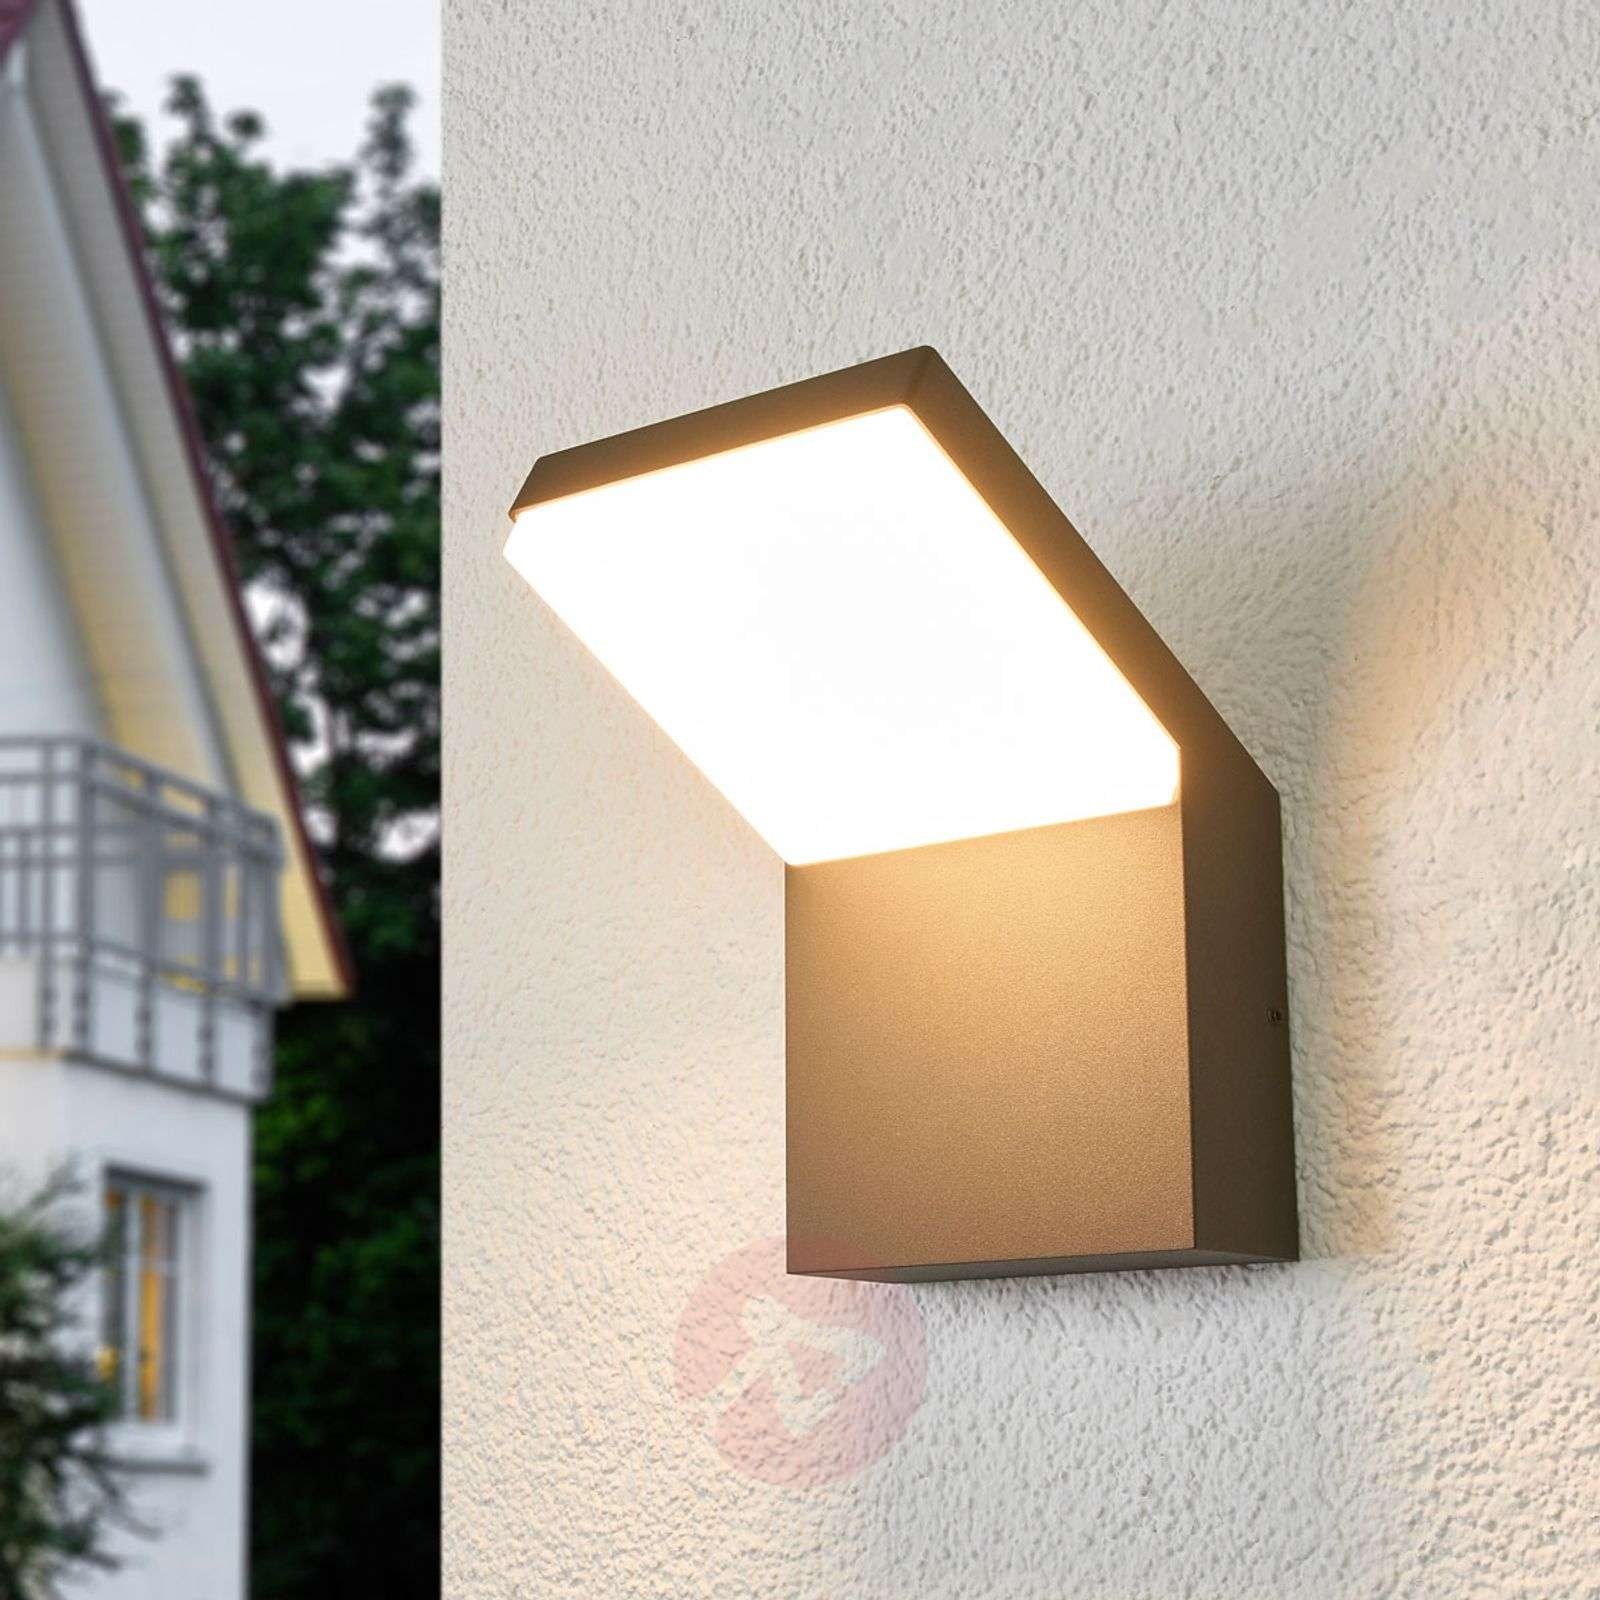 Downlighting LED outdoor wall lamp Yolena-9619117-02